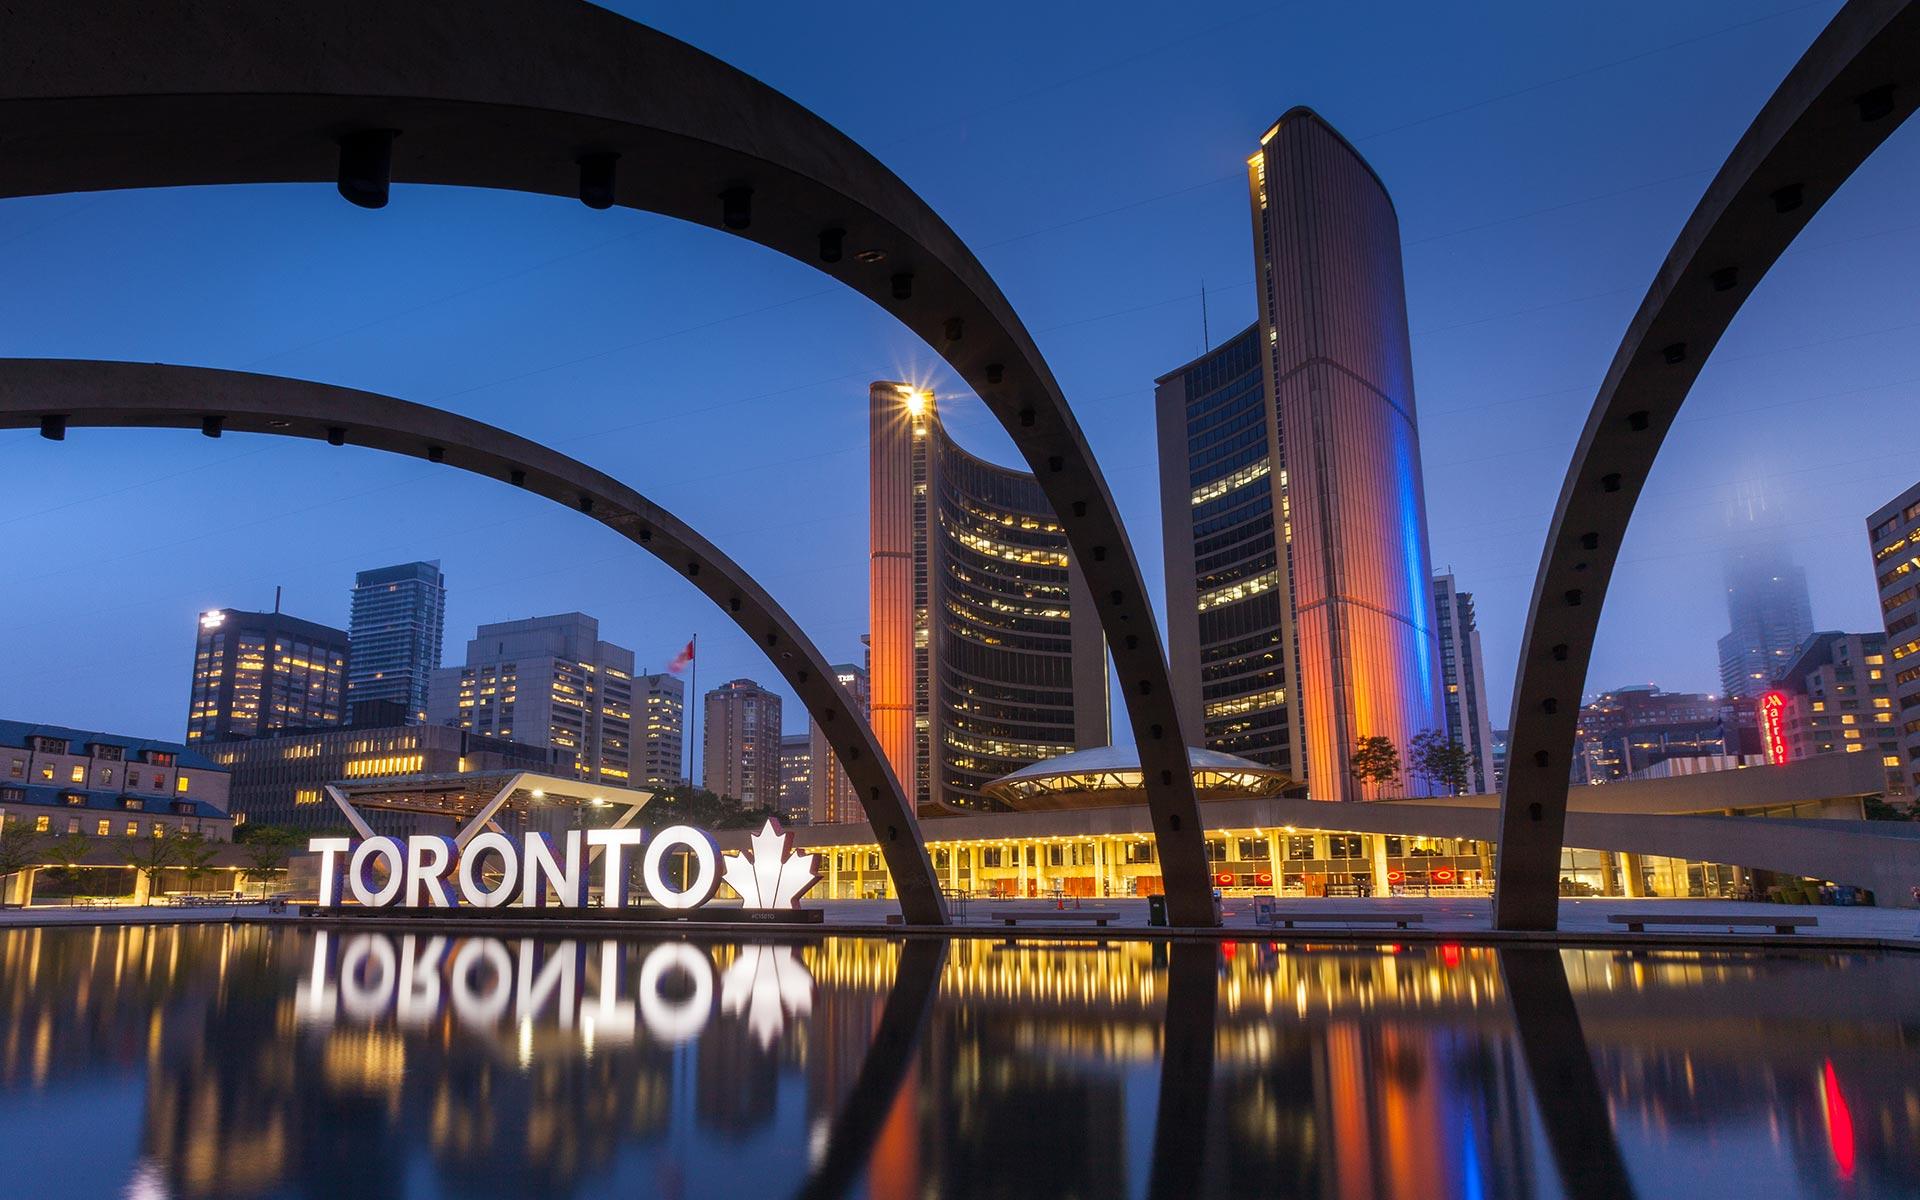 Signe Toronto